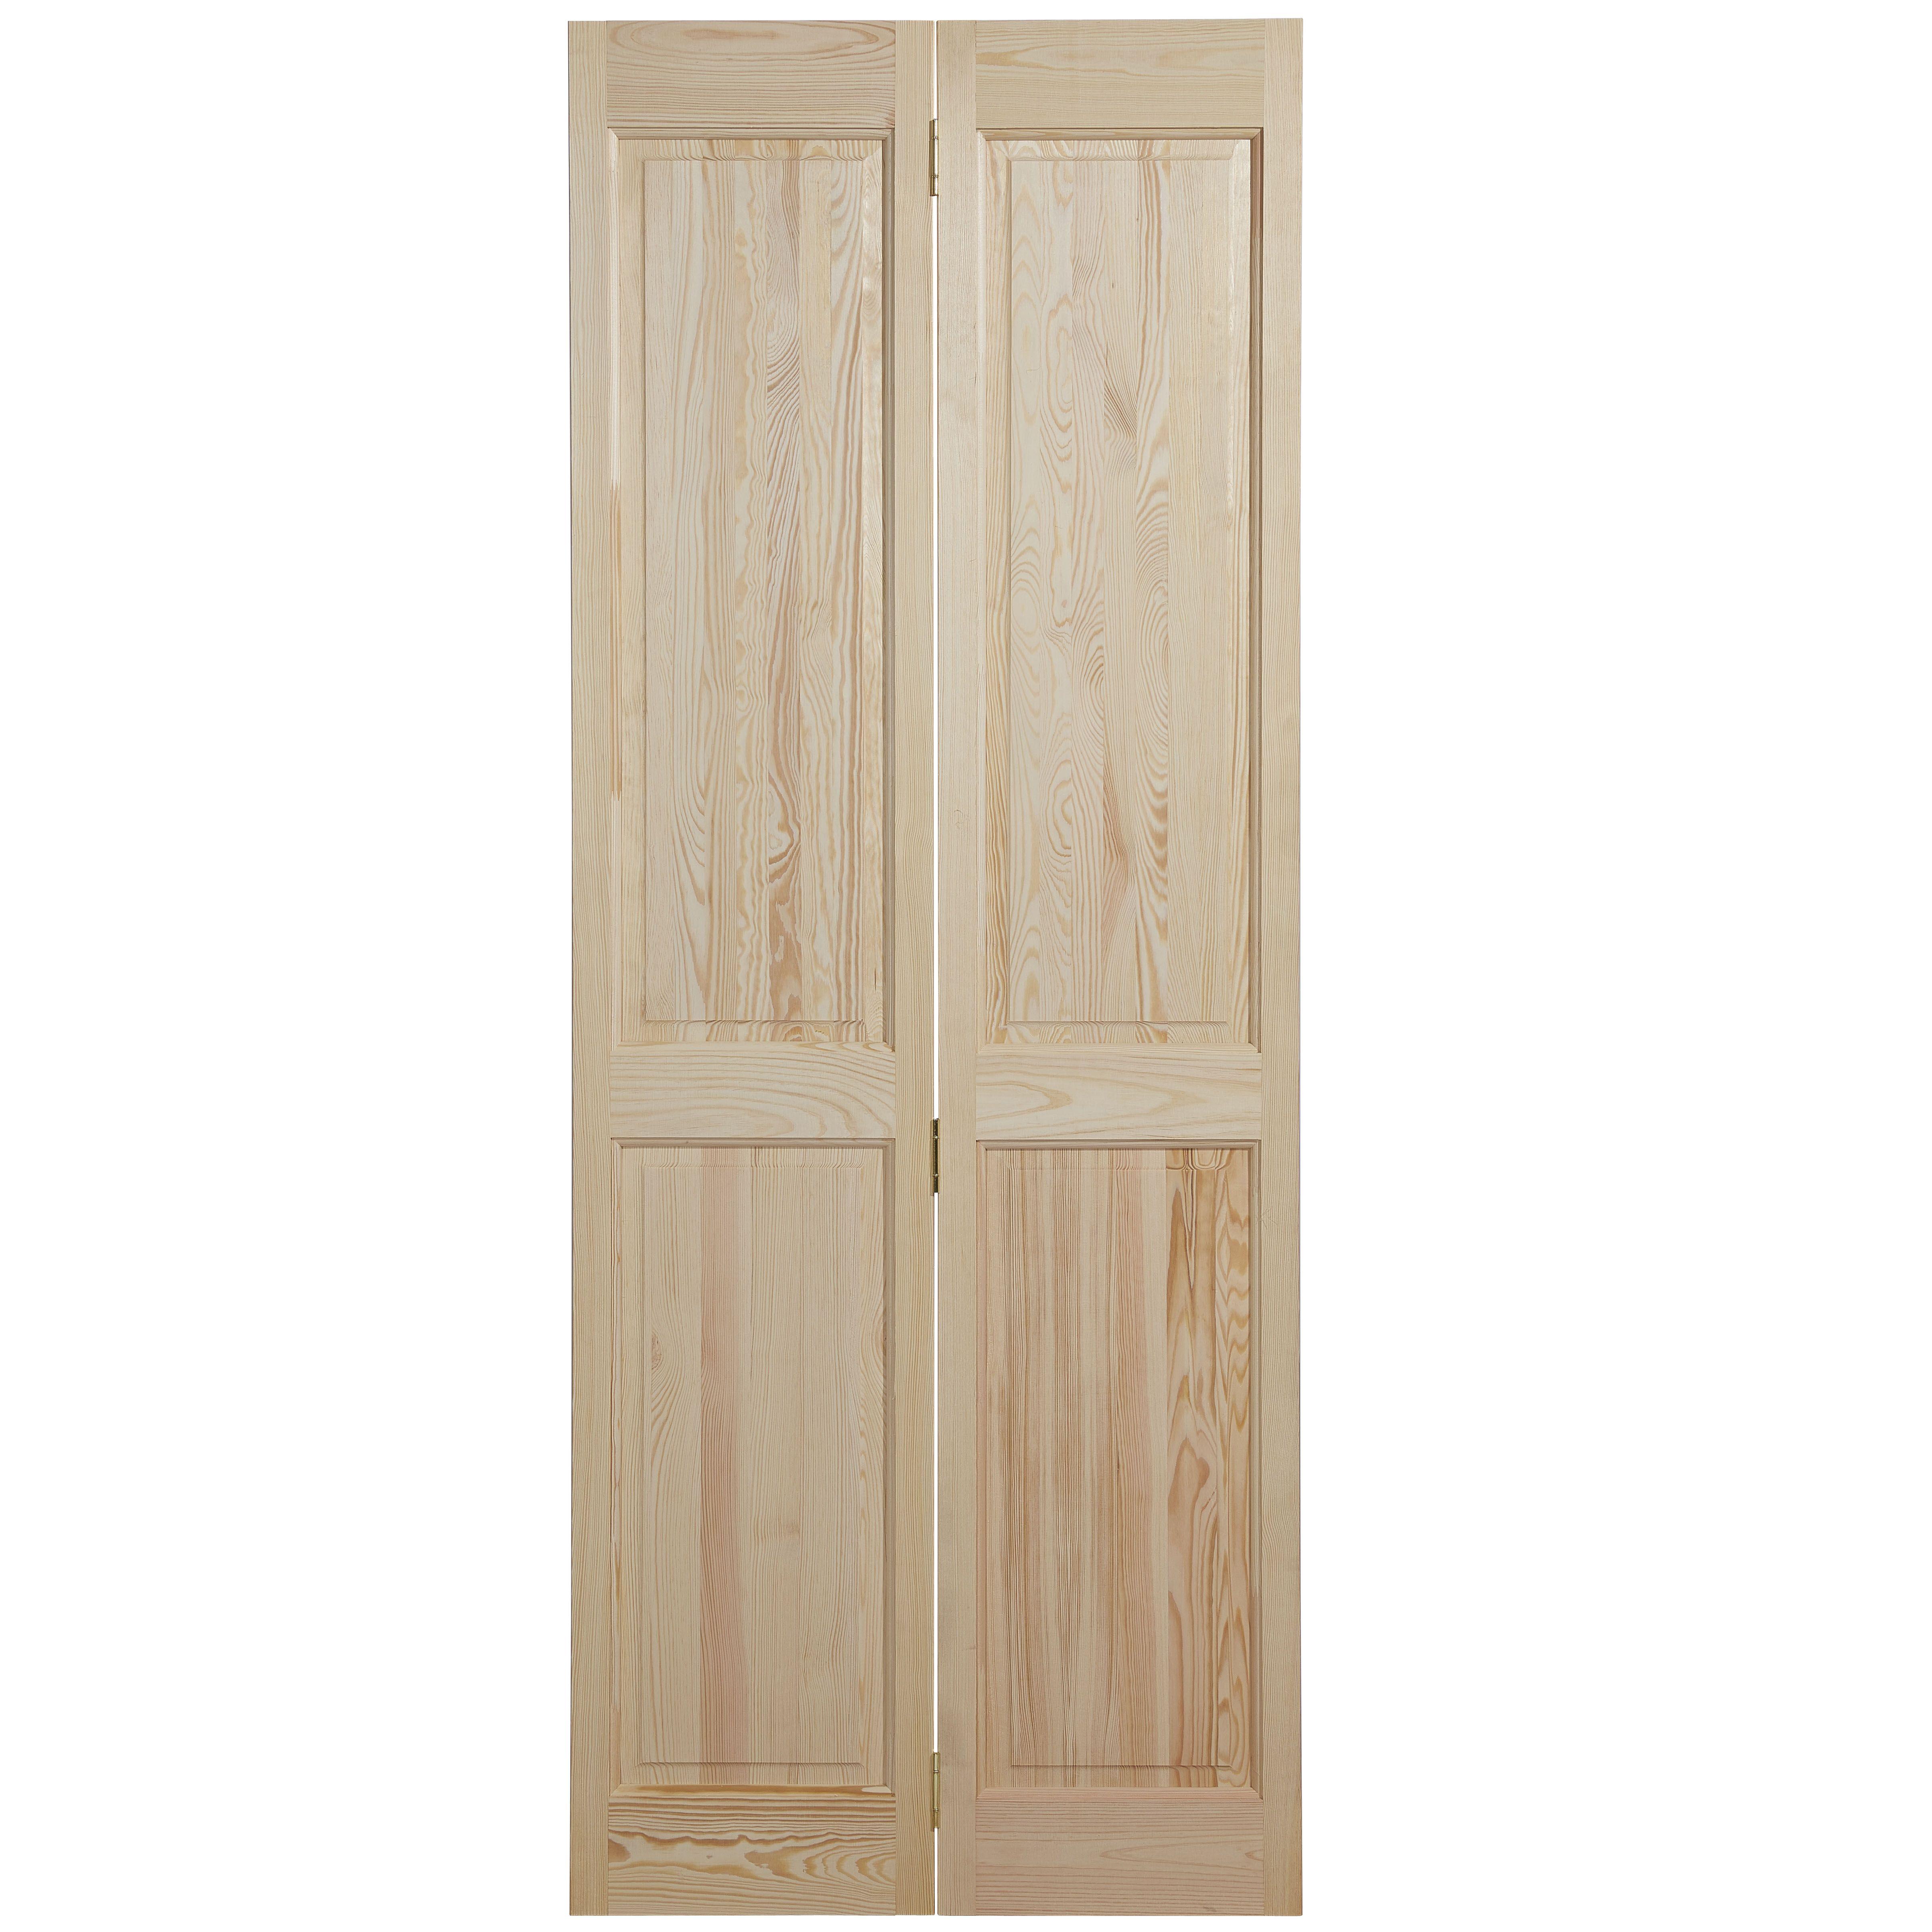 4 Panel Clear Pine Internal Bi-fold Door, (h)1981mm (w)686mm